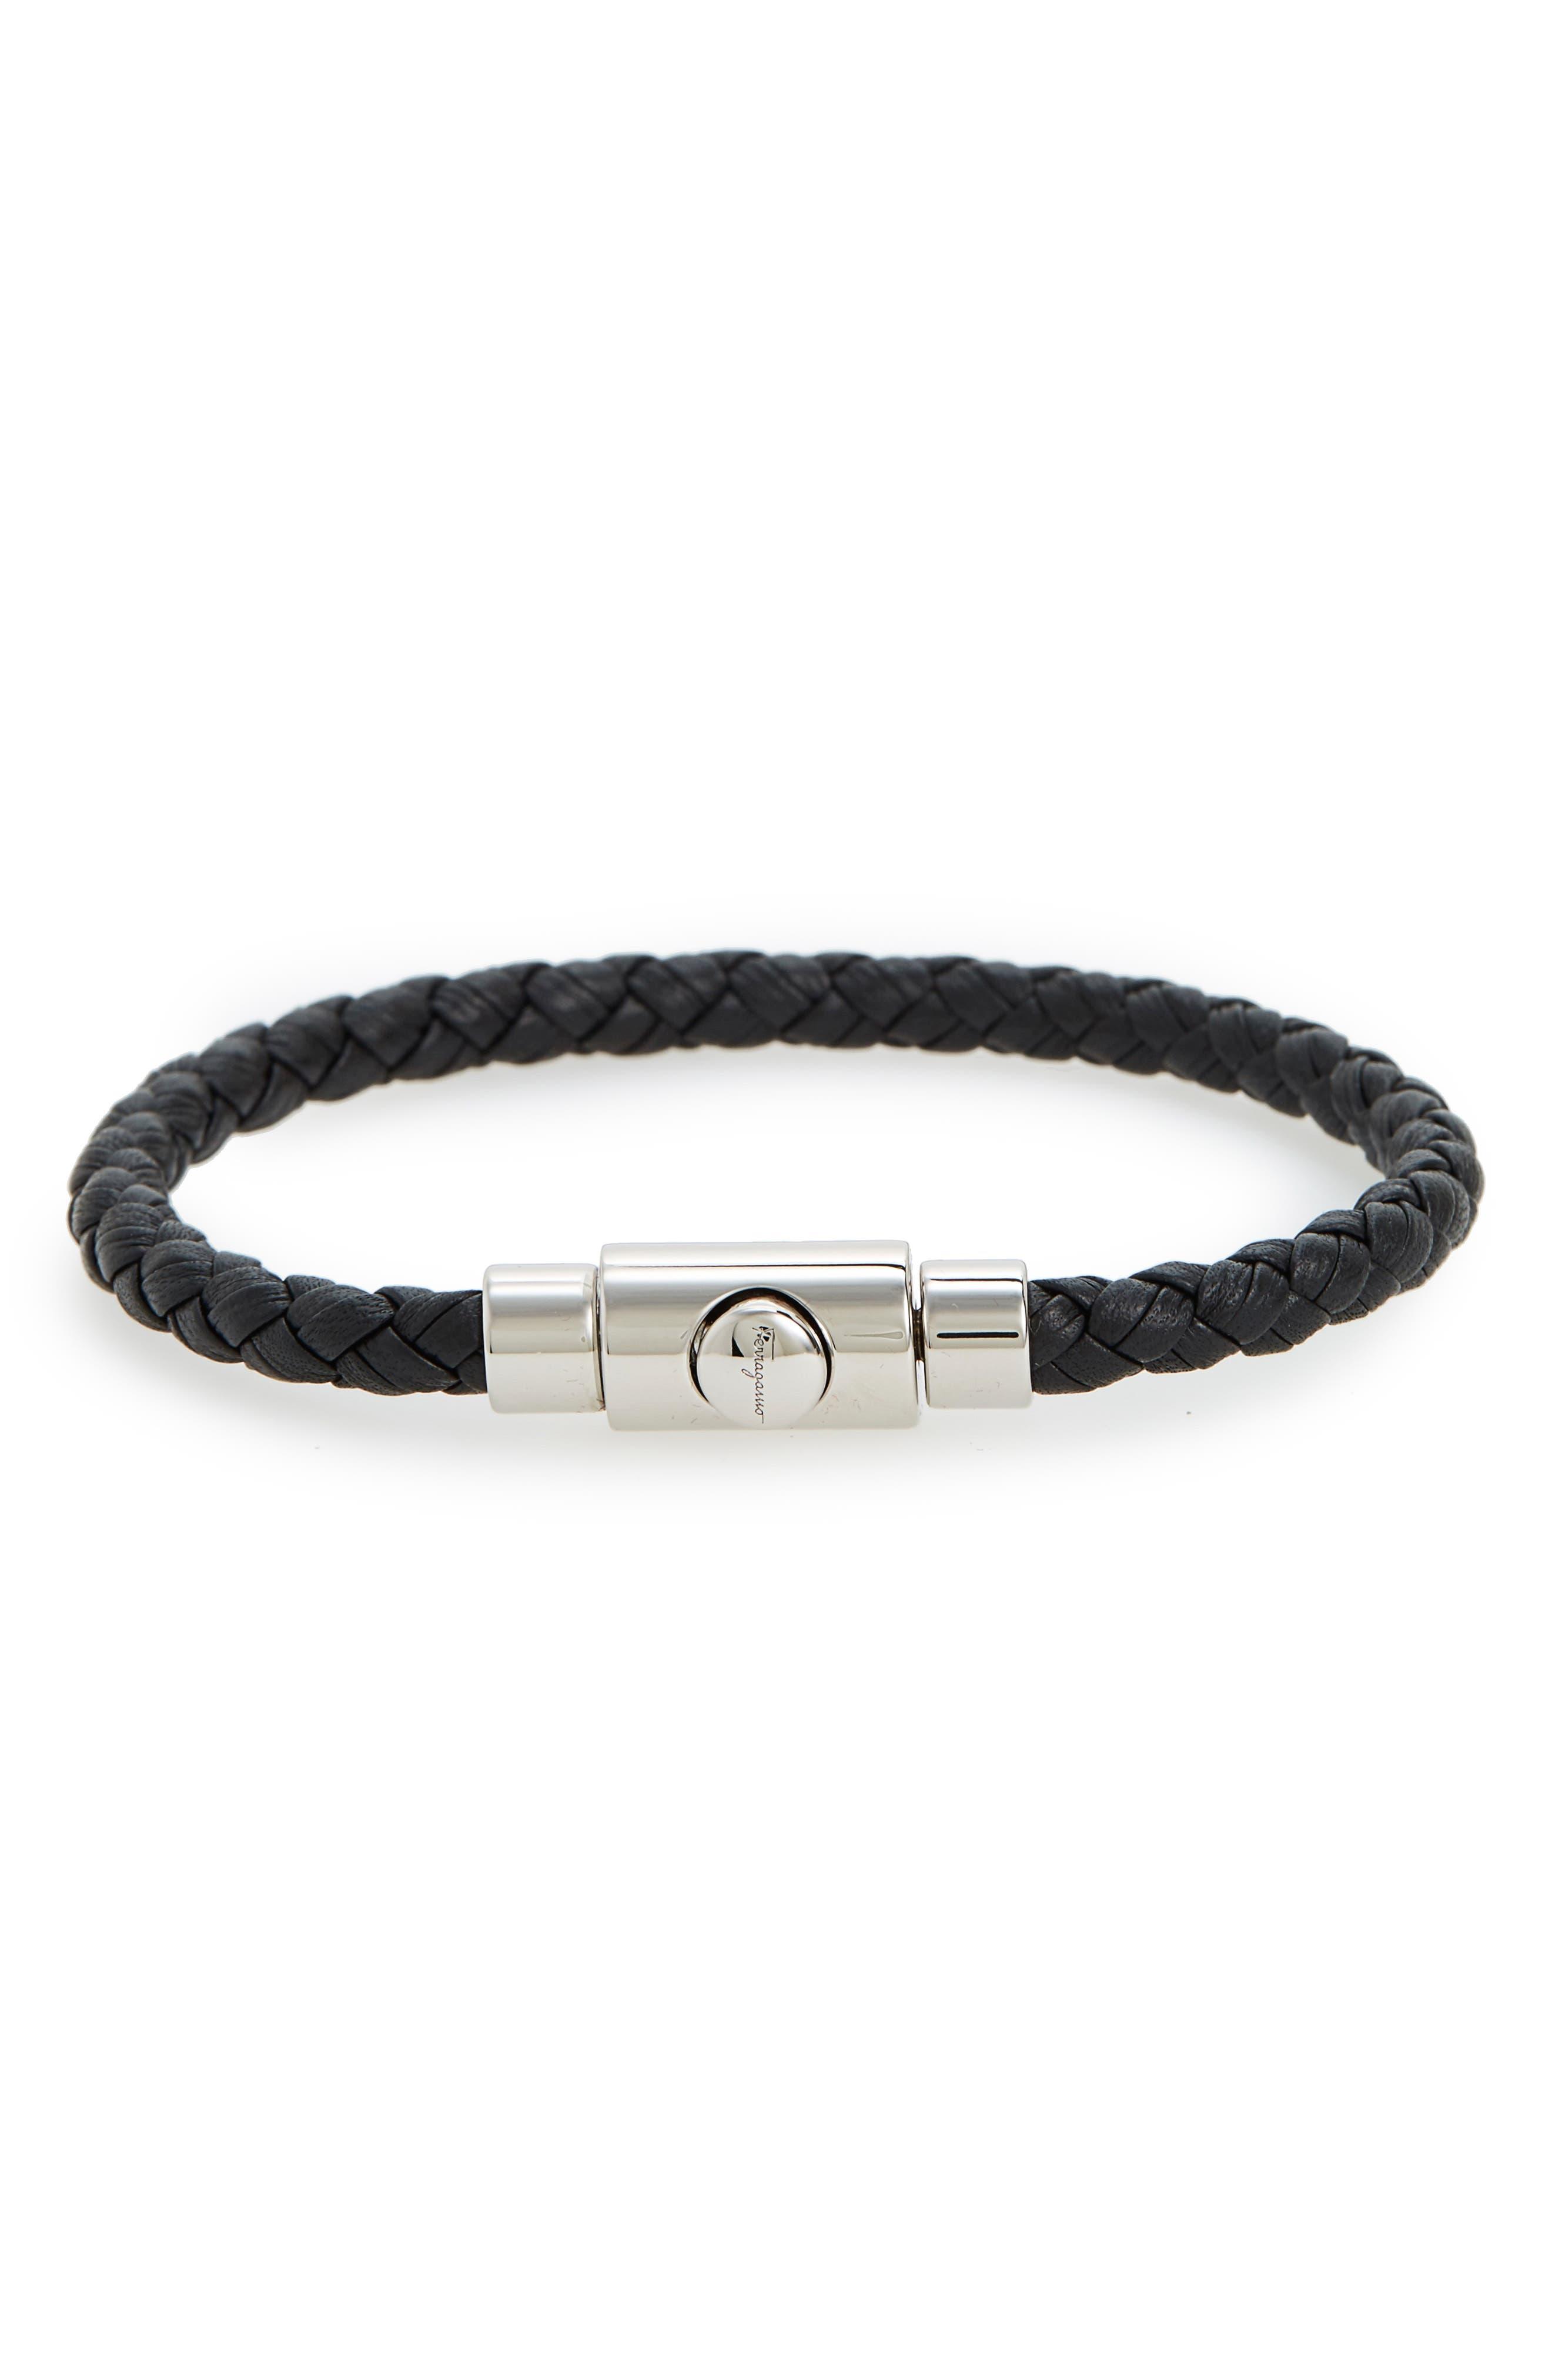 Main Image - Salvatore Ferragamo Braided Leather Bracelet